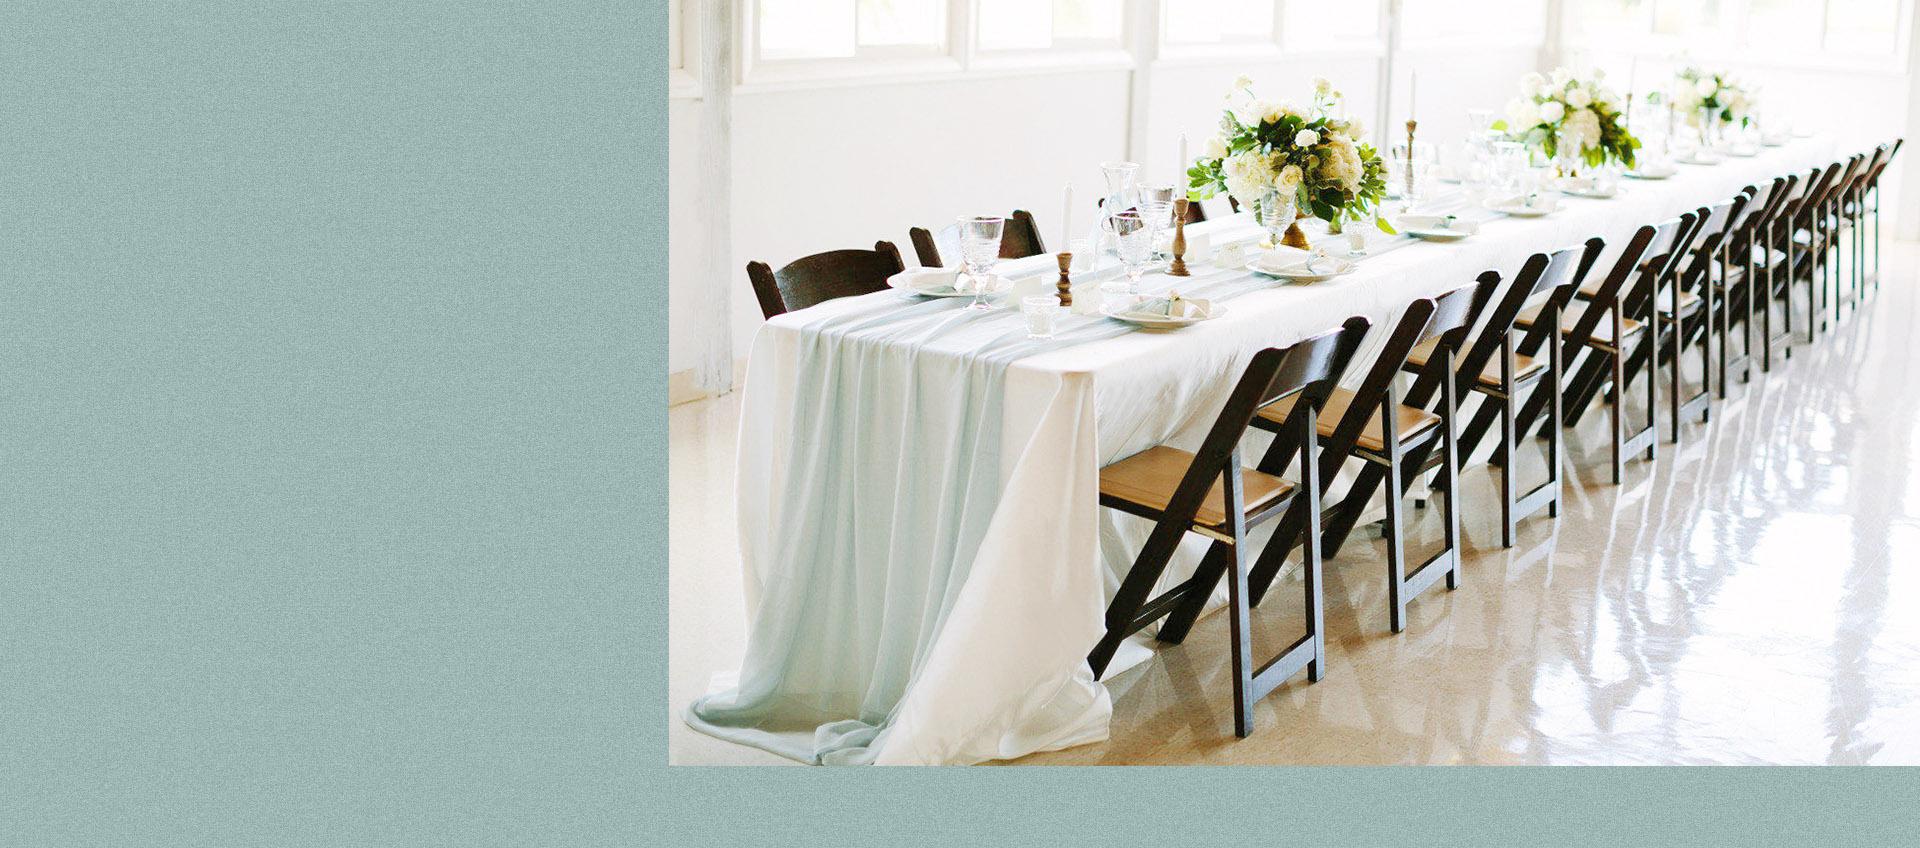 ▁   ORGANIC AND ROMATTIC  TABLE DESIGN  * ???